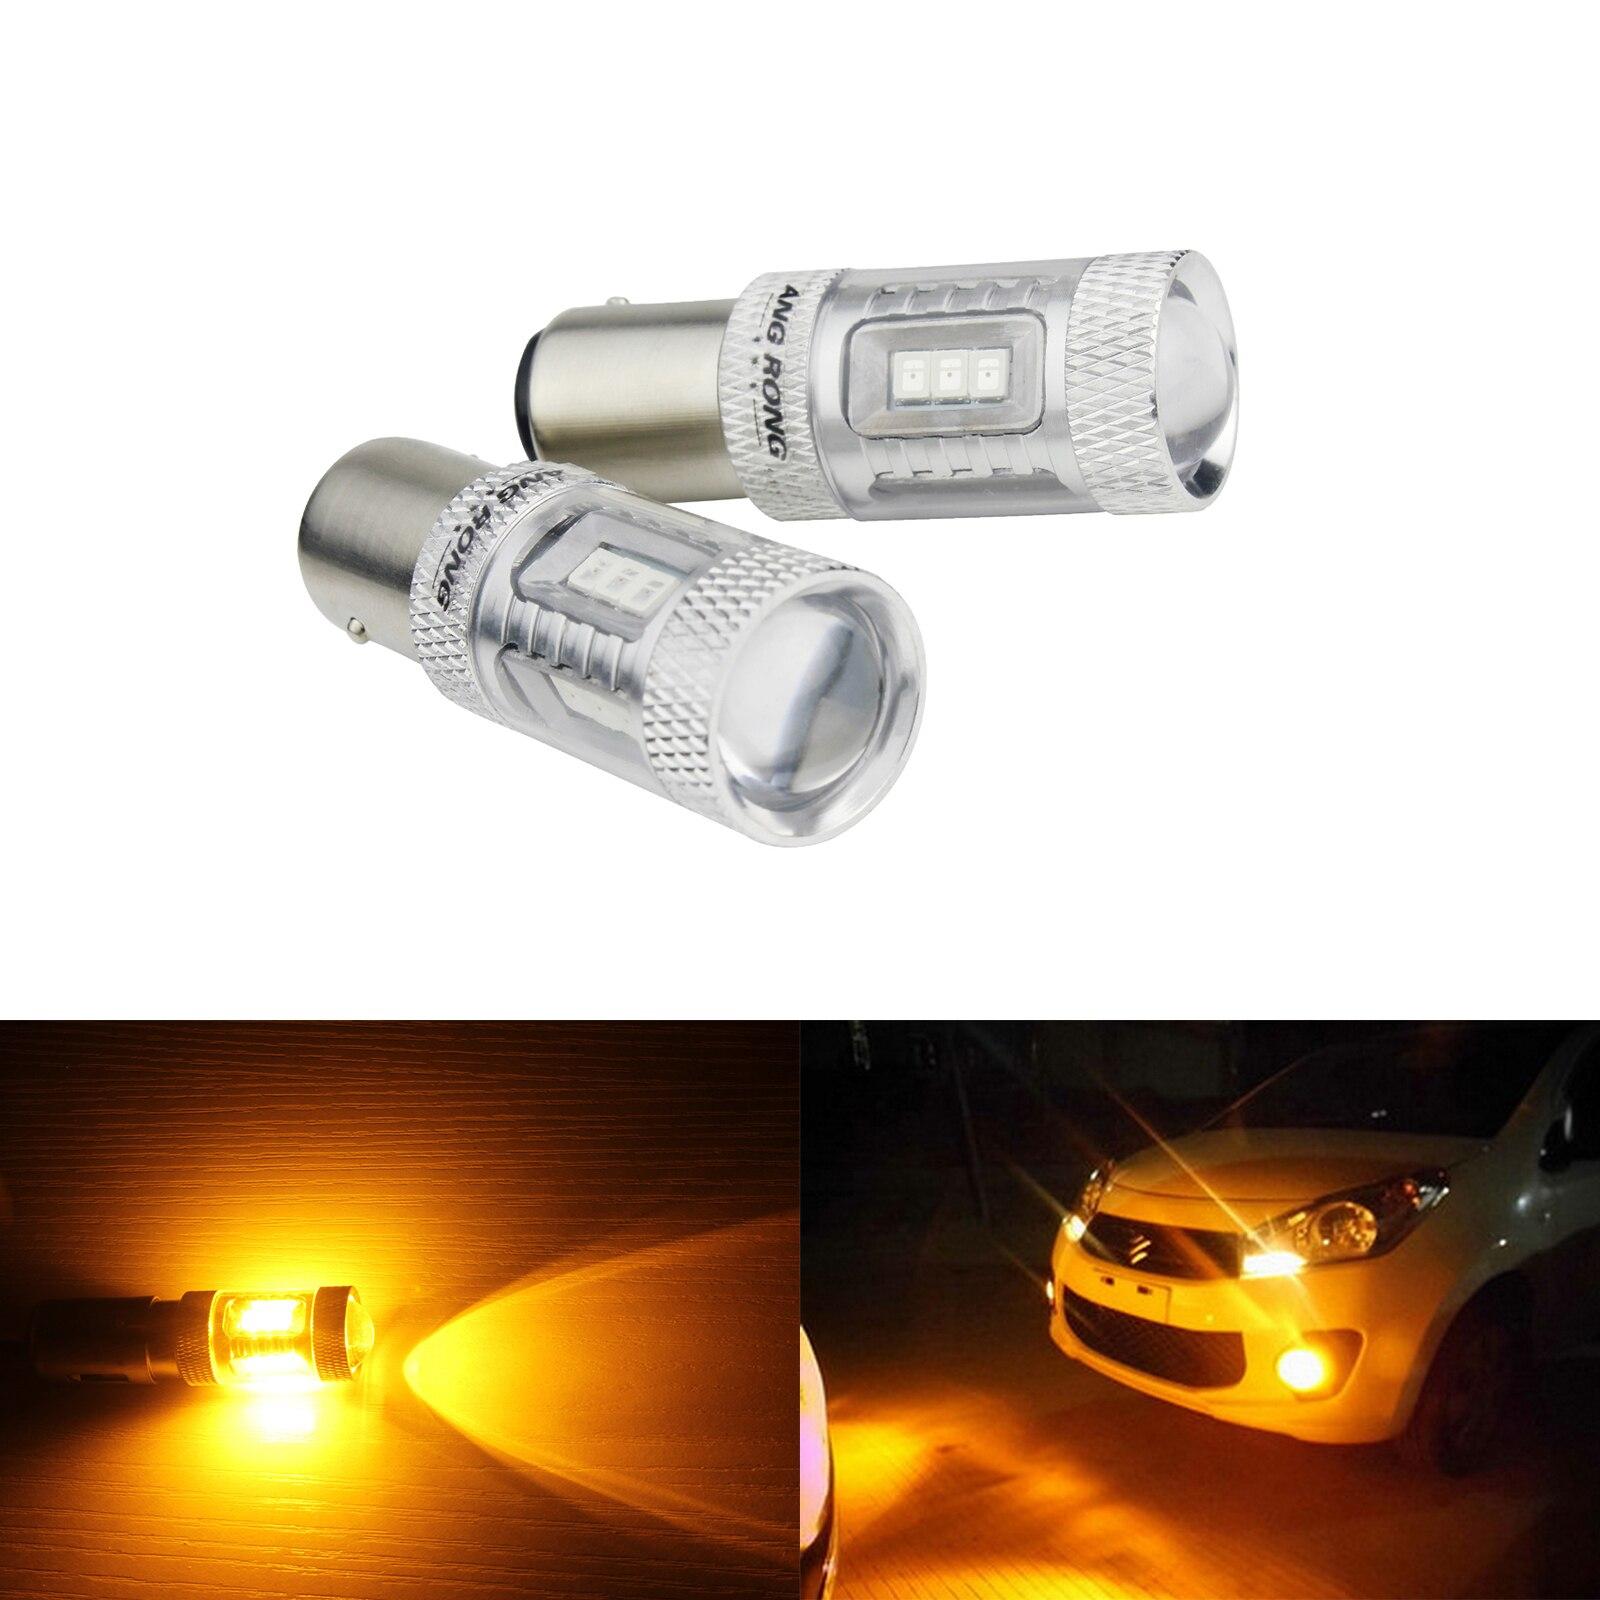 ANGRONG 2x380x1157 BAY15D P21/5 W bombilla led de coche 15 SMD 2835 marcha atrás LED de freno luz de freno lámparas ámbar 12V 12V